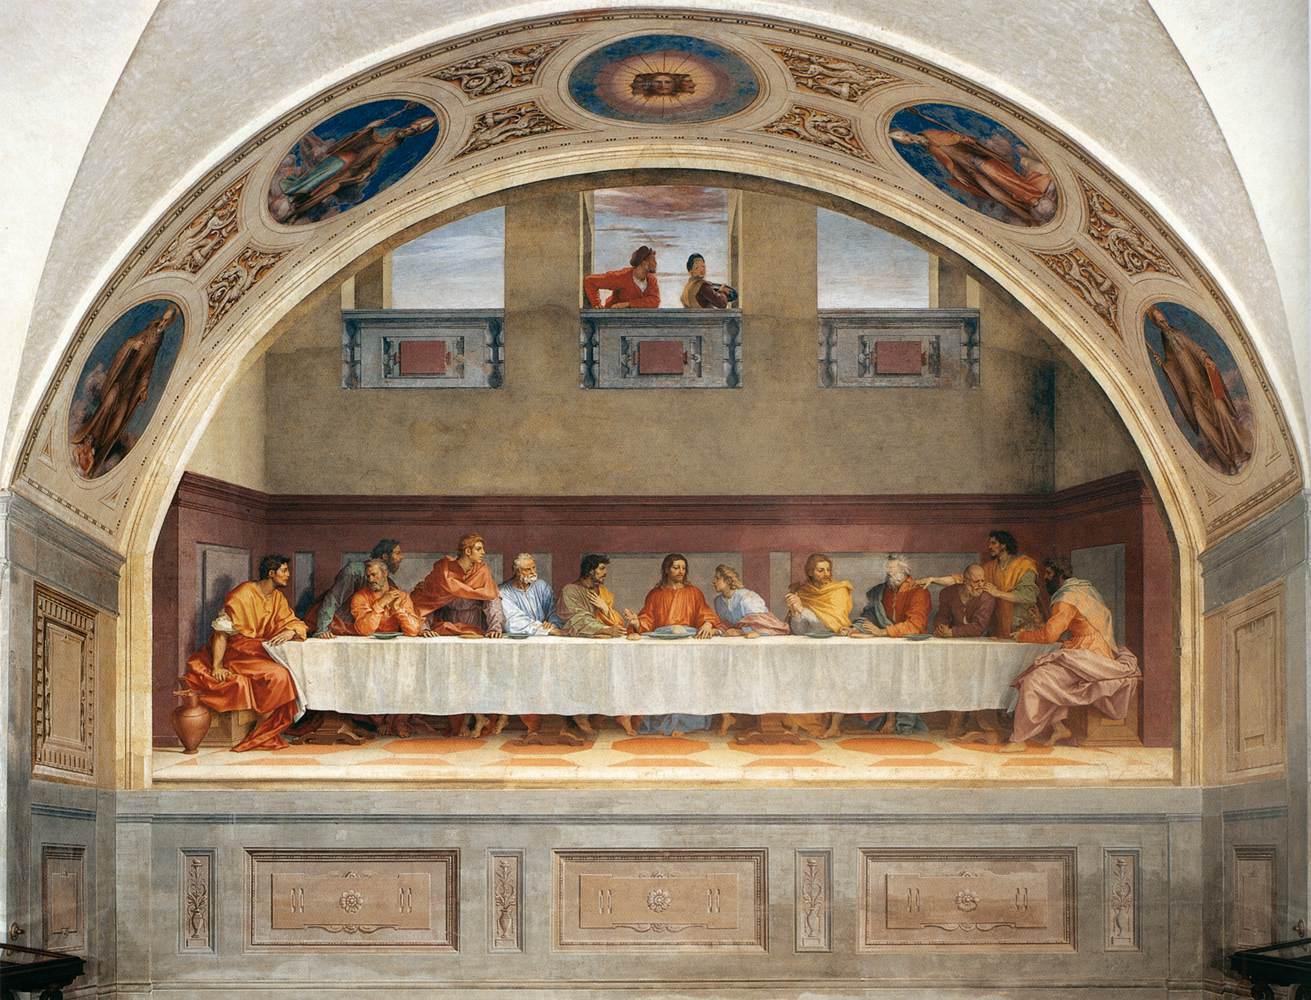 L'arte del grande Andrea del Sarto in un audiolibro esclusivo